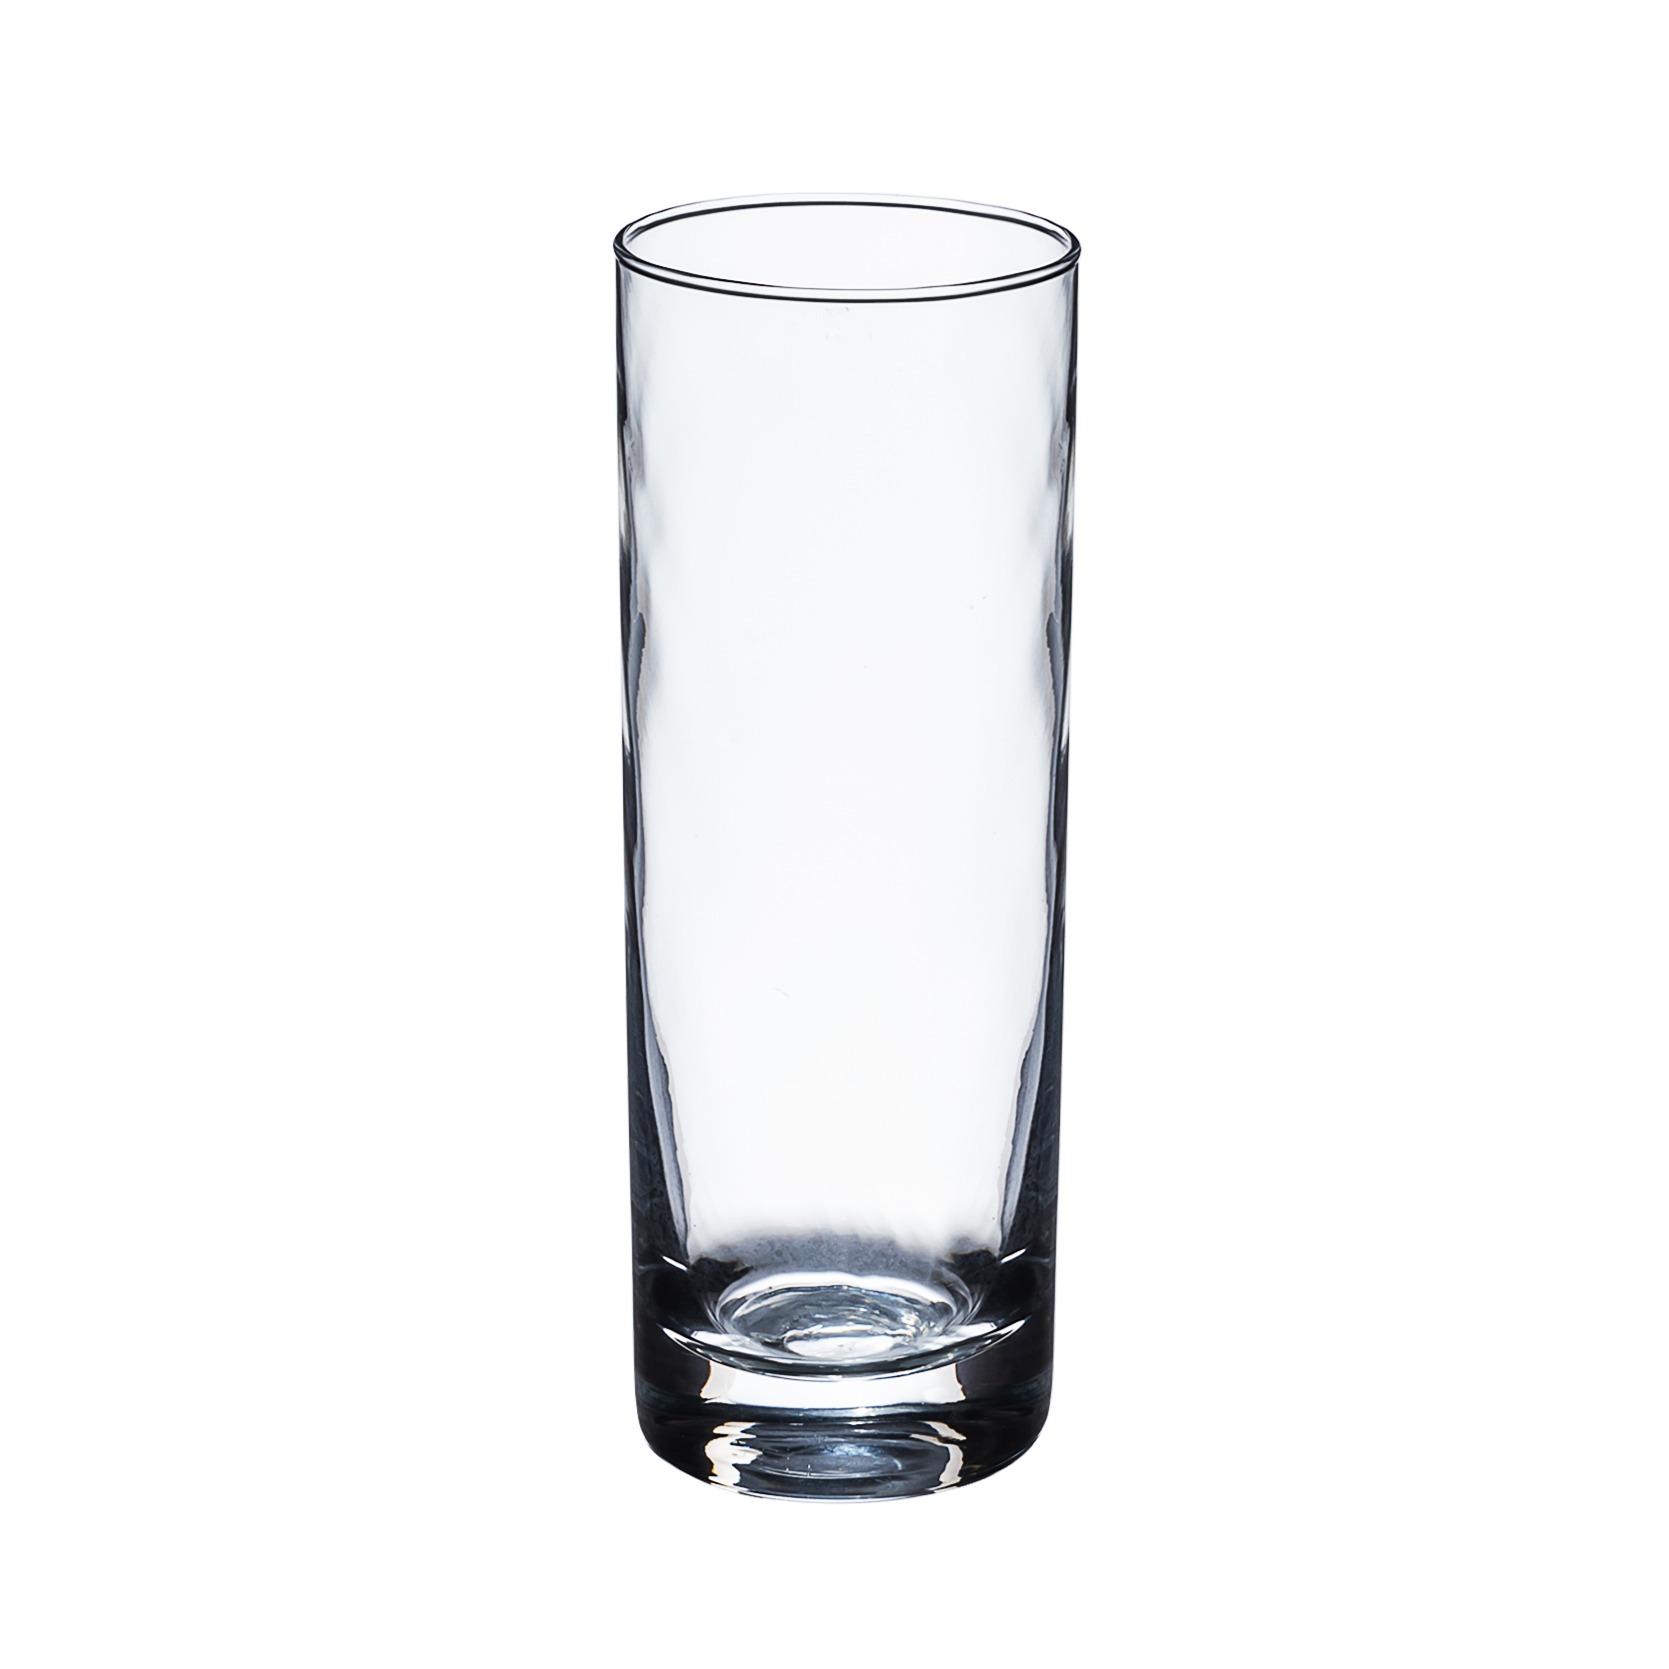 Copo Long Drink de Vidro 325ml Transparente - Bianchini